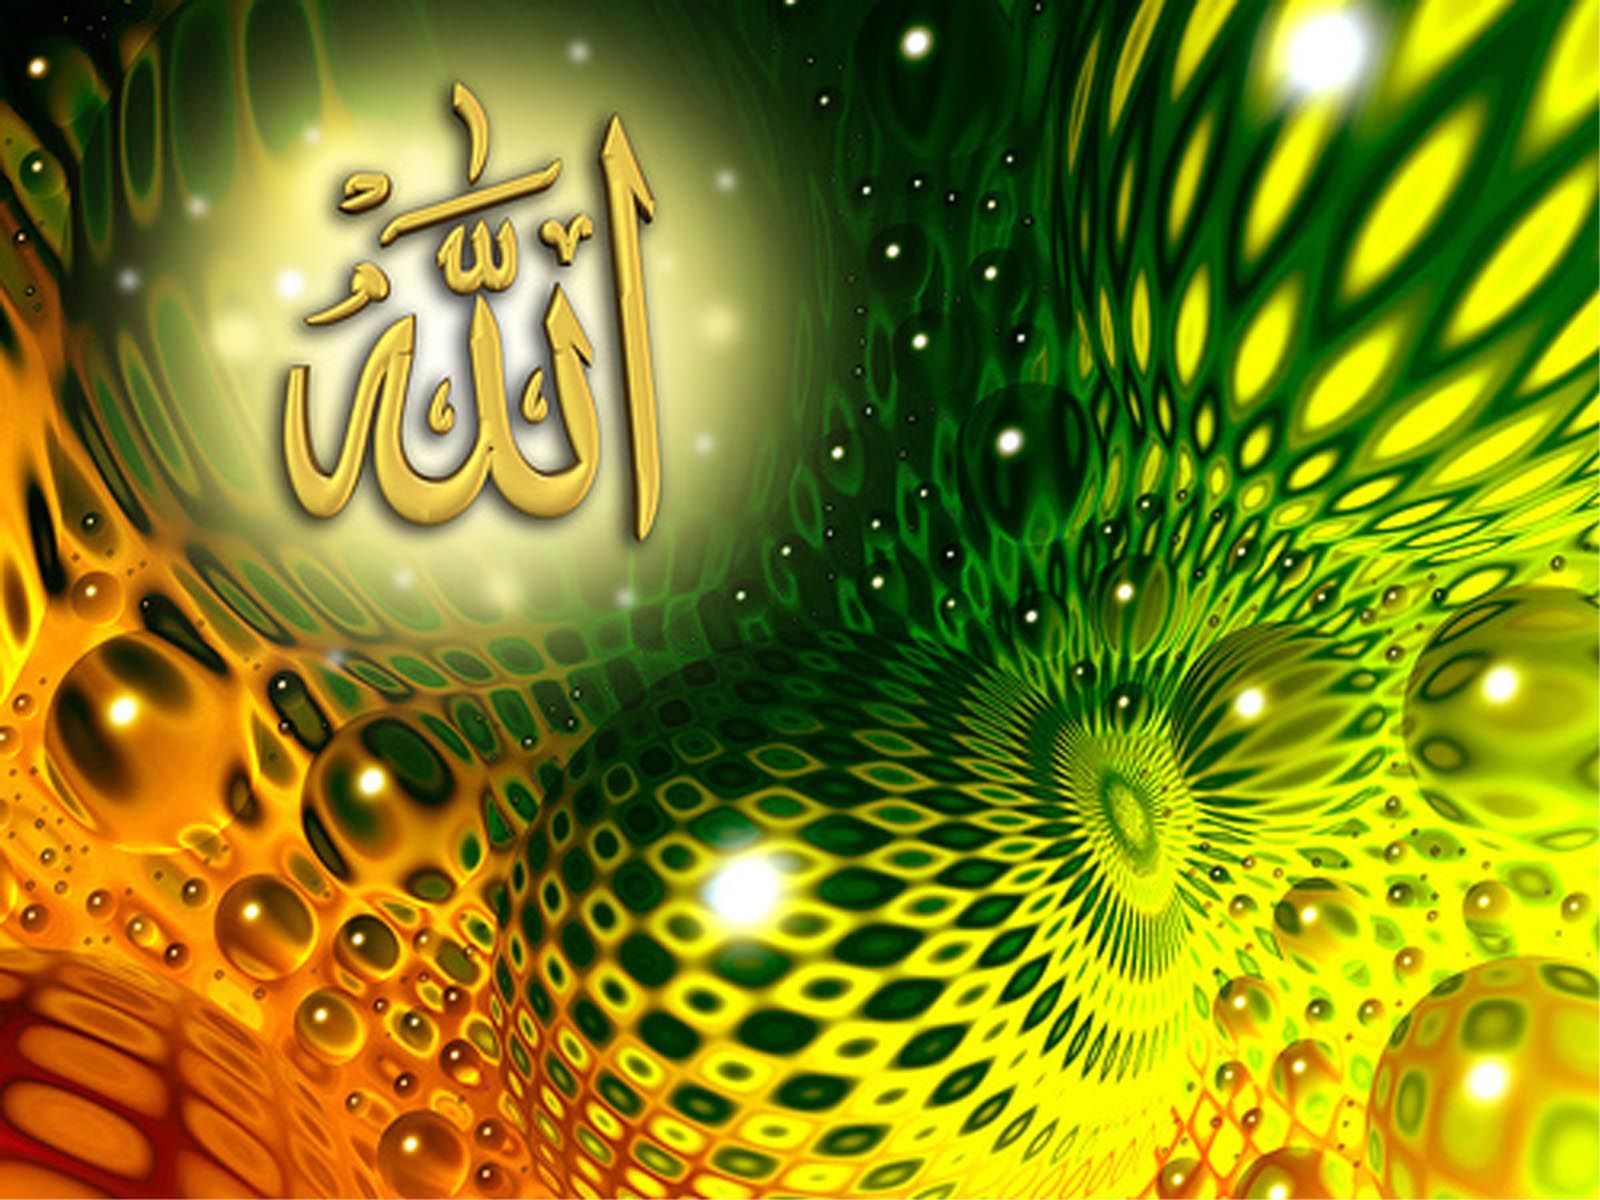 beautiful allah name calligraphy wallpaper photo | allah name hd